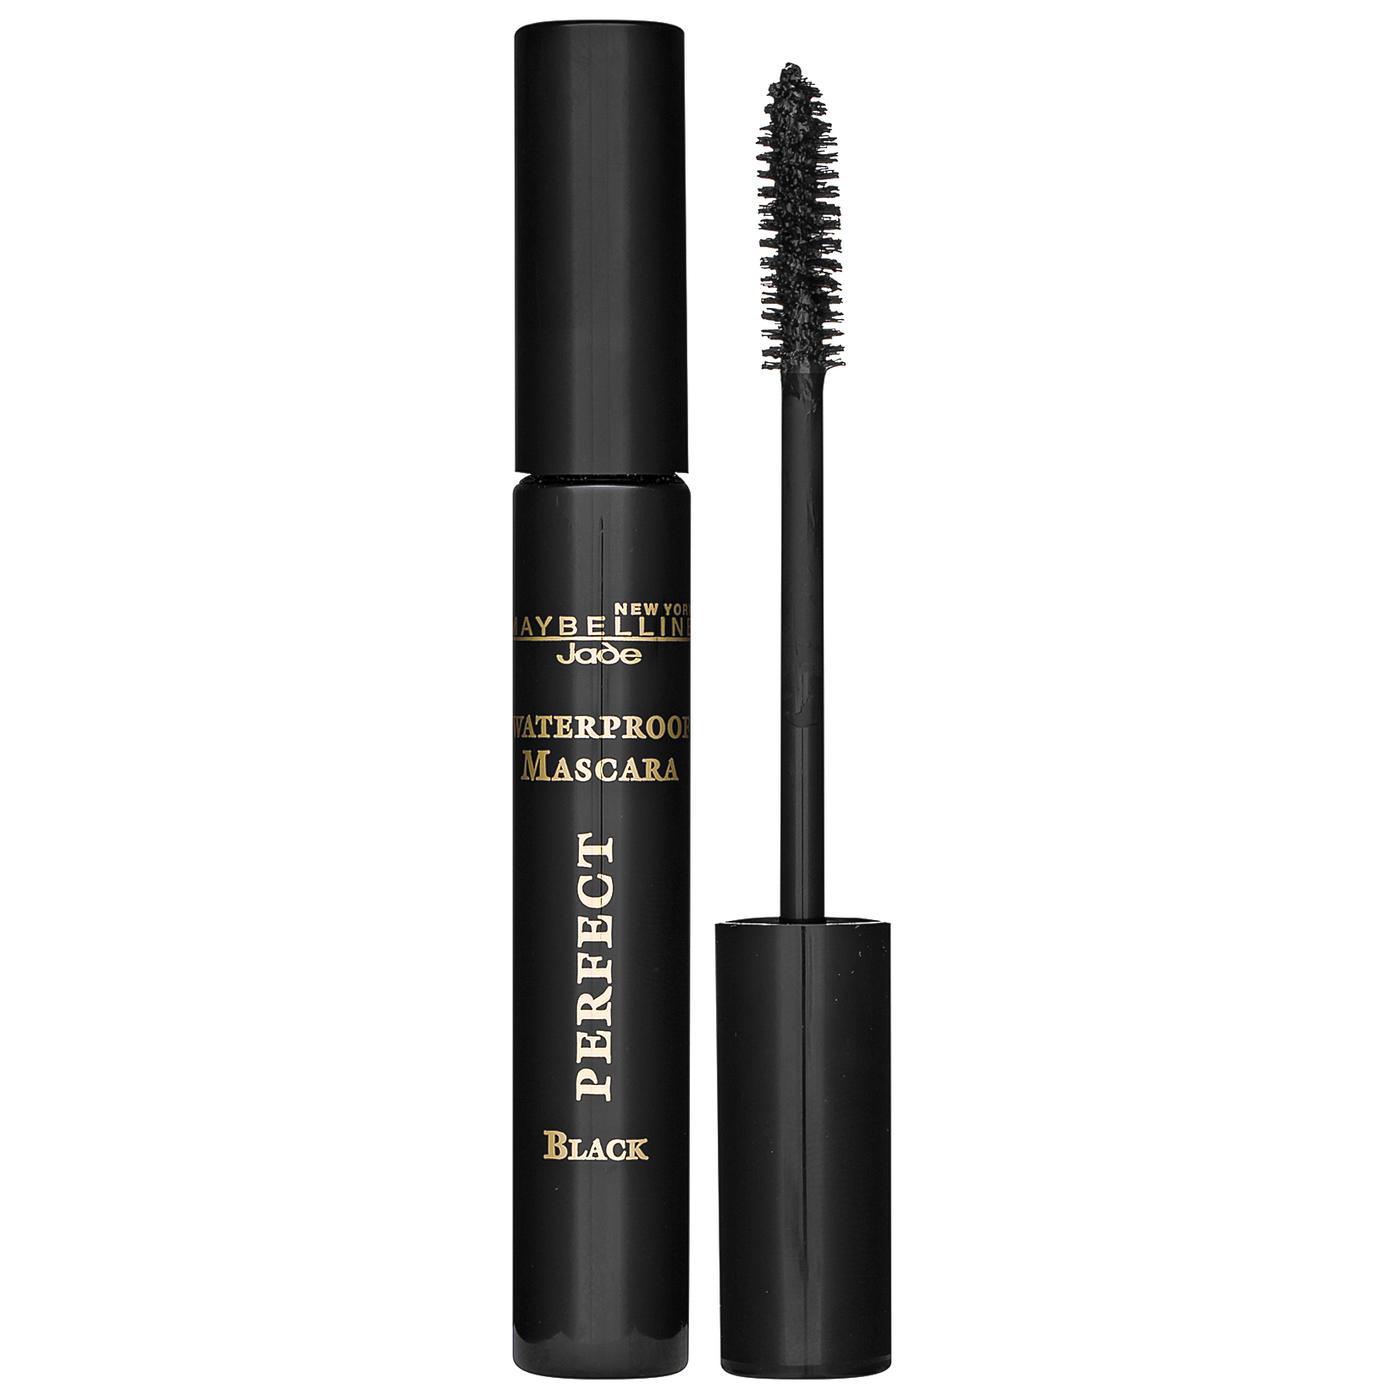 Maybelline Waterproof Mascara New 7 Ml York Parfait rdsCxthQ